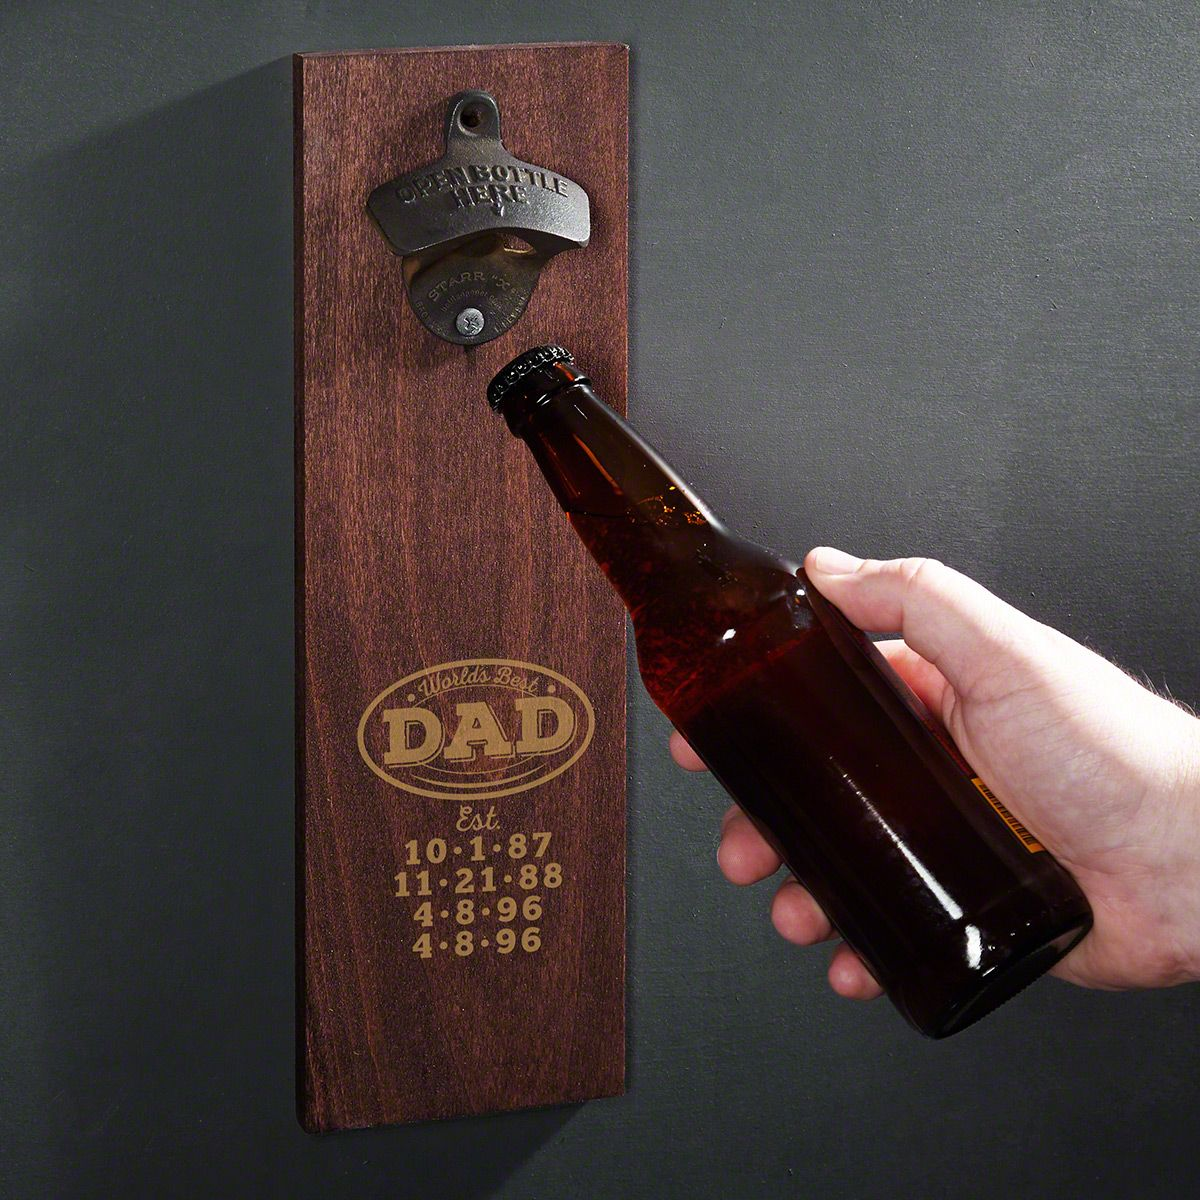 Worlds Best Dad Personalized Wooden Wall Bottle Opener